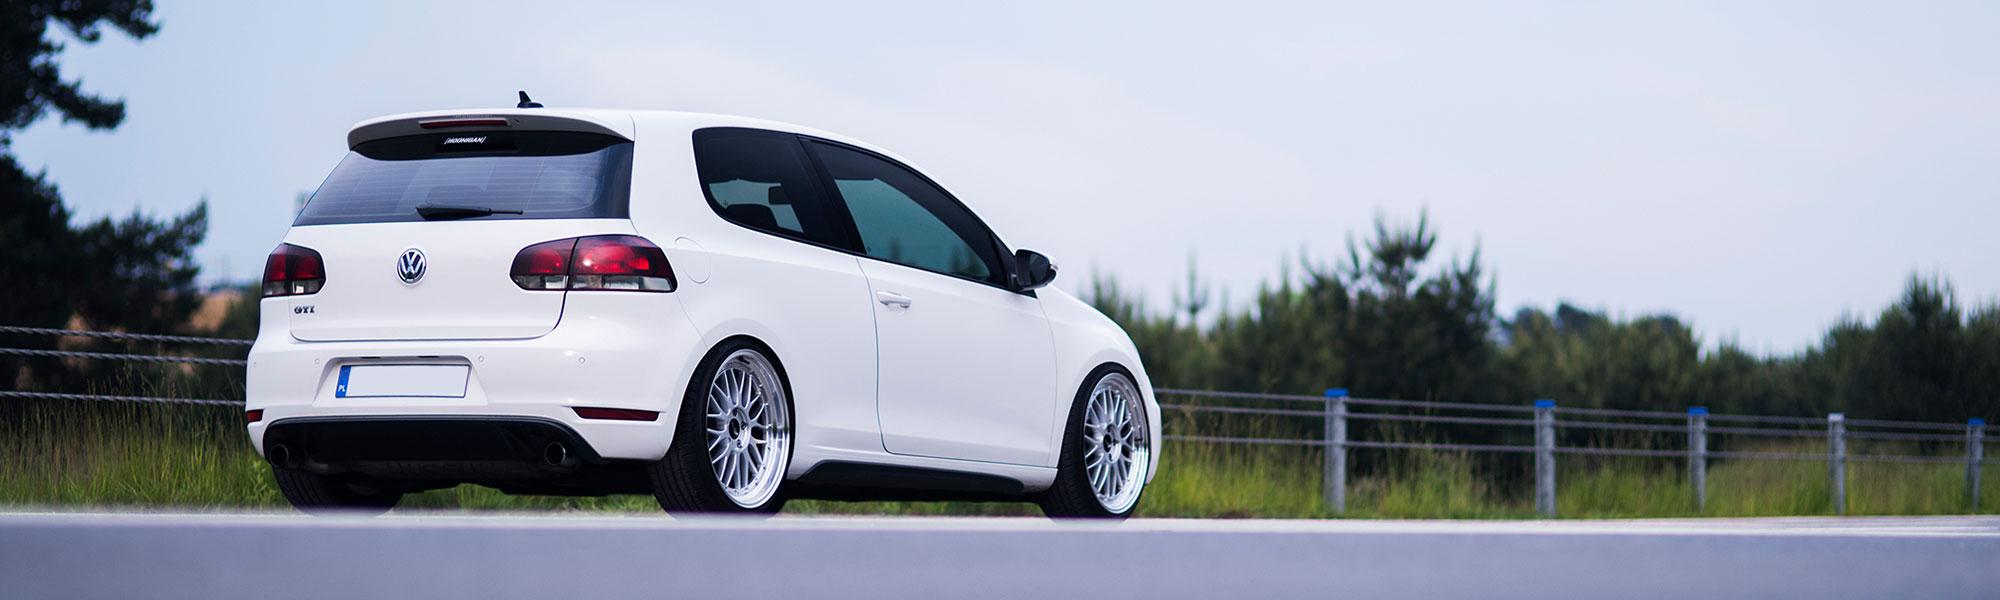 Slide_JR_Wheels_Car-1